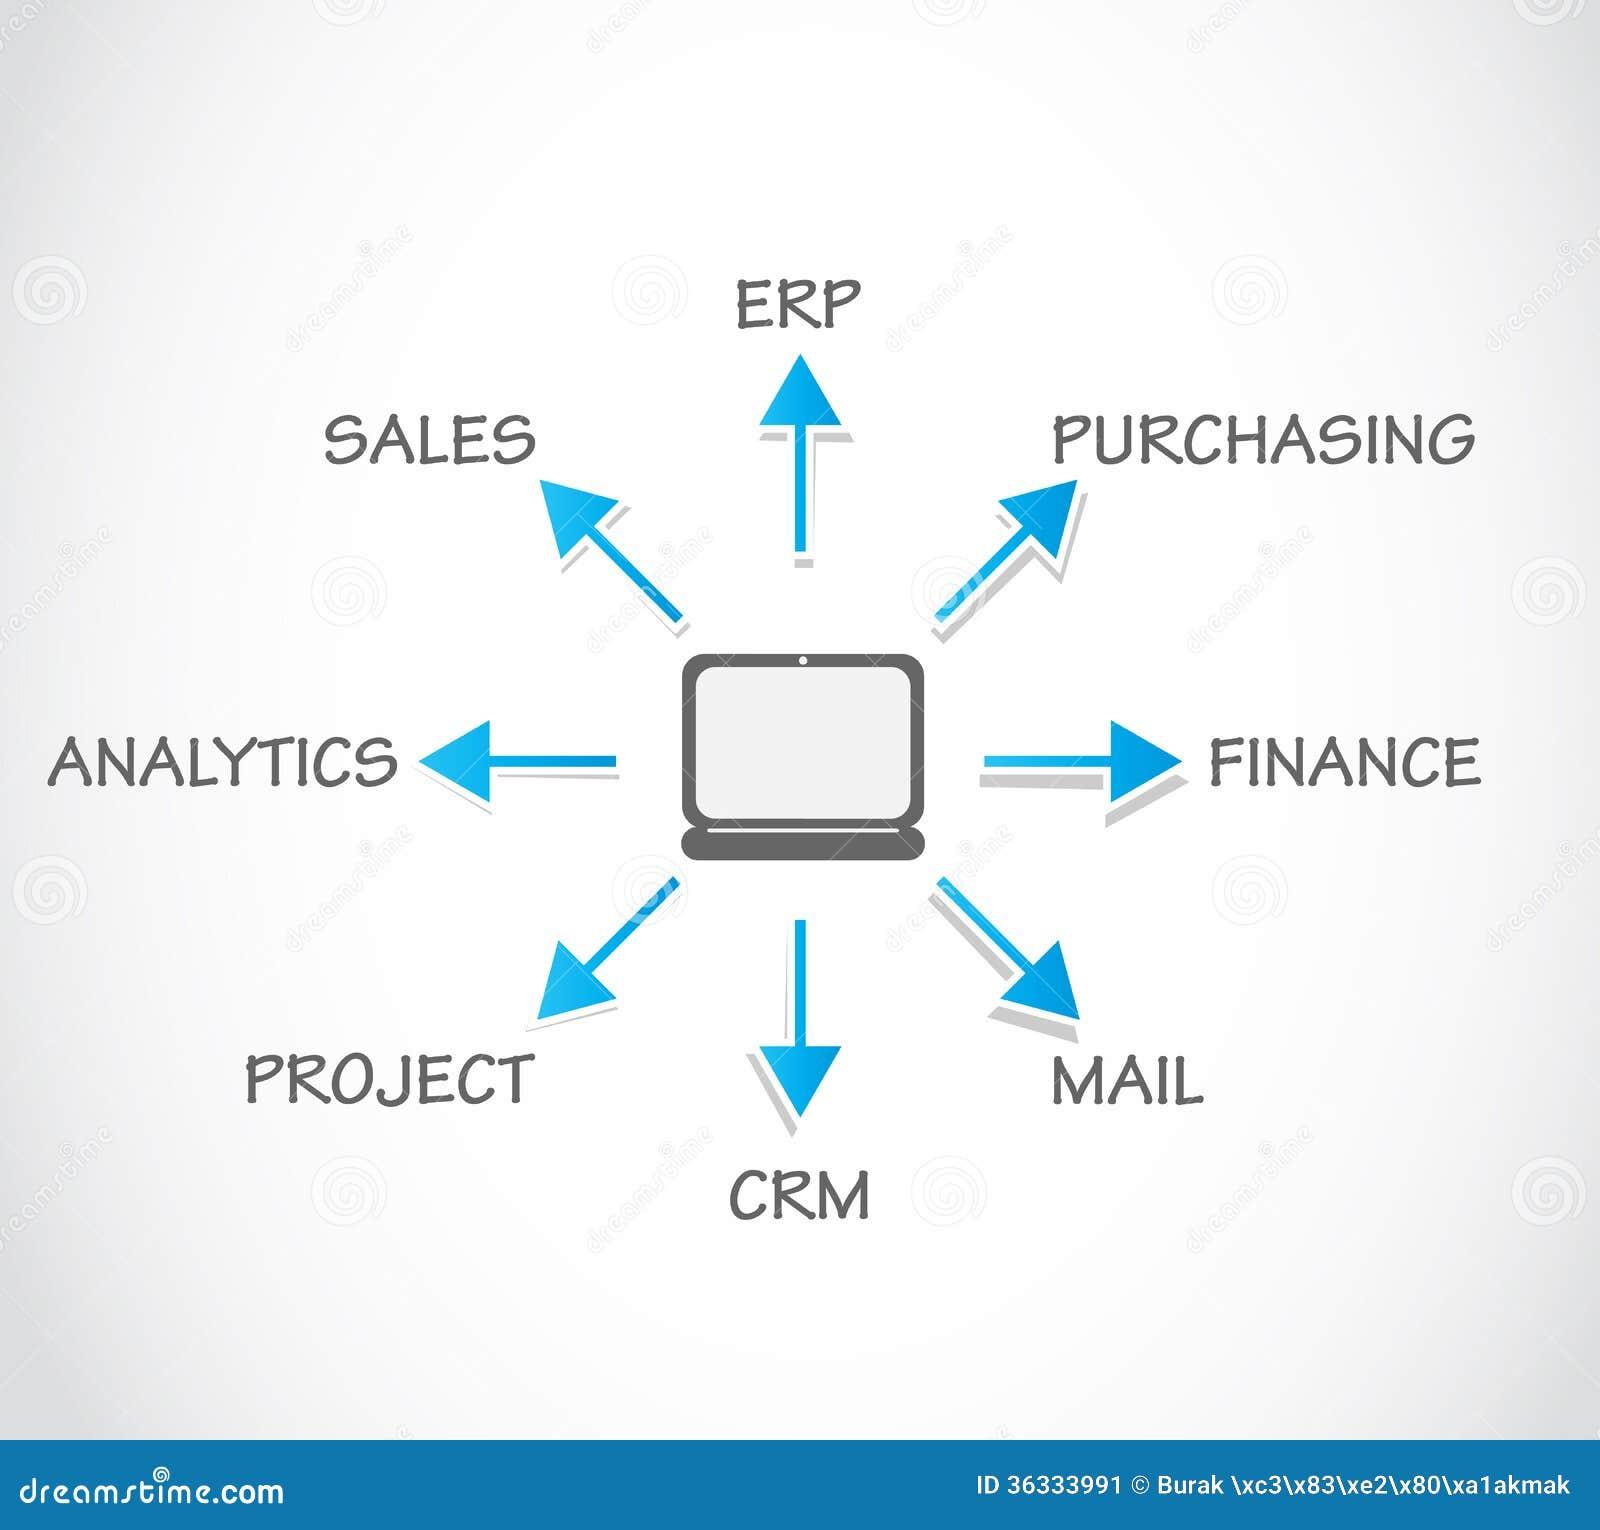 Erp Site Map: Enterprise Resource Planning ERP Stock Image